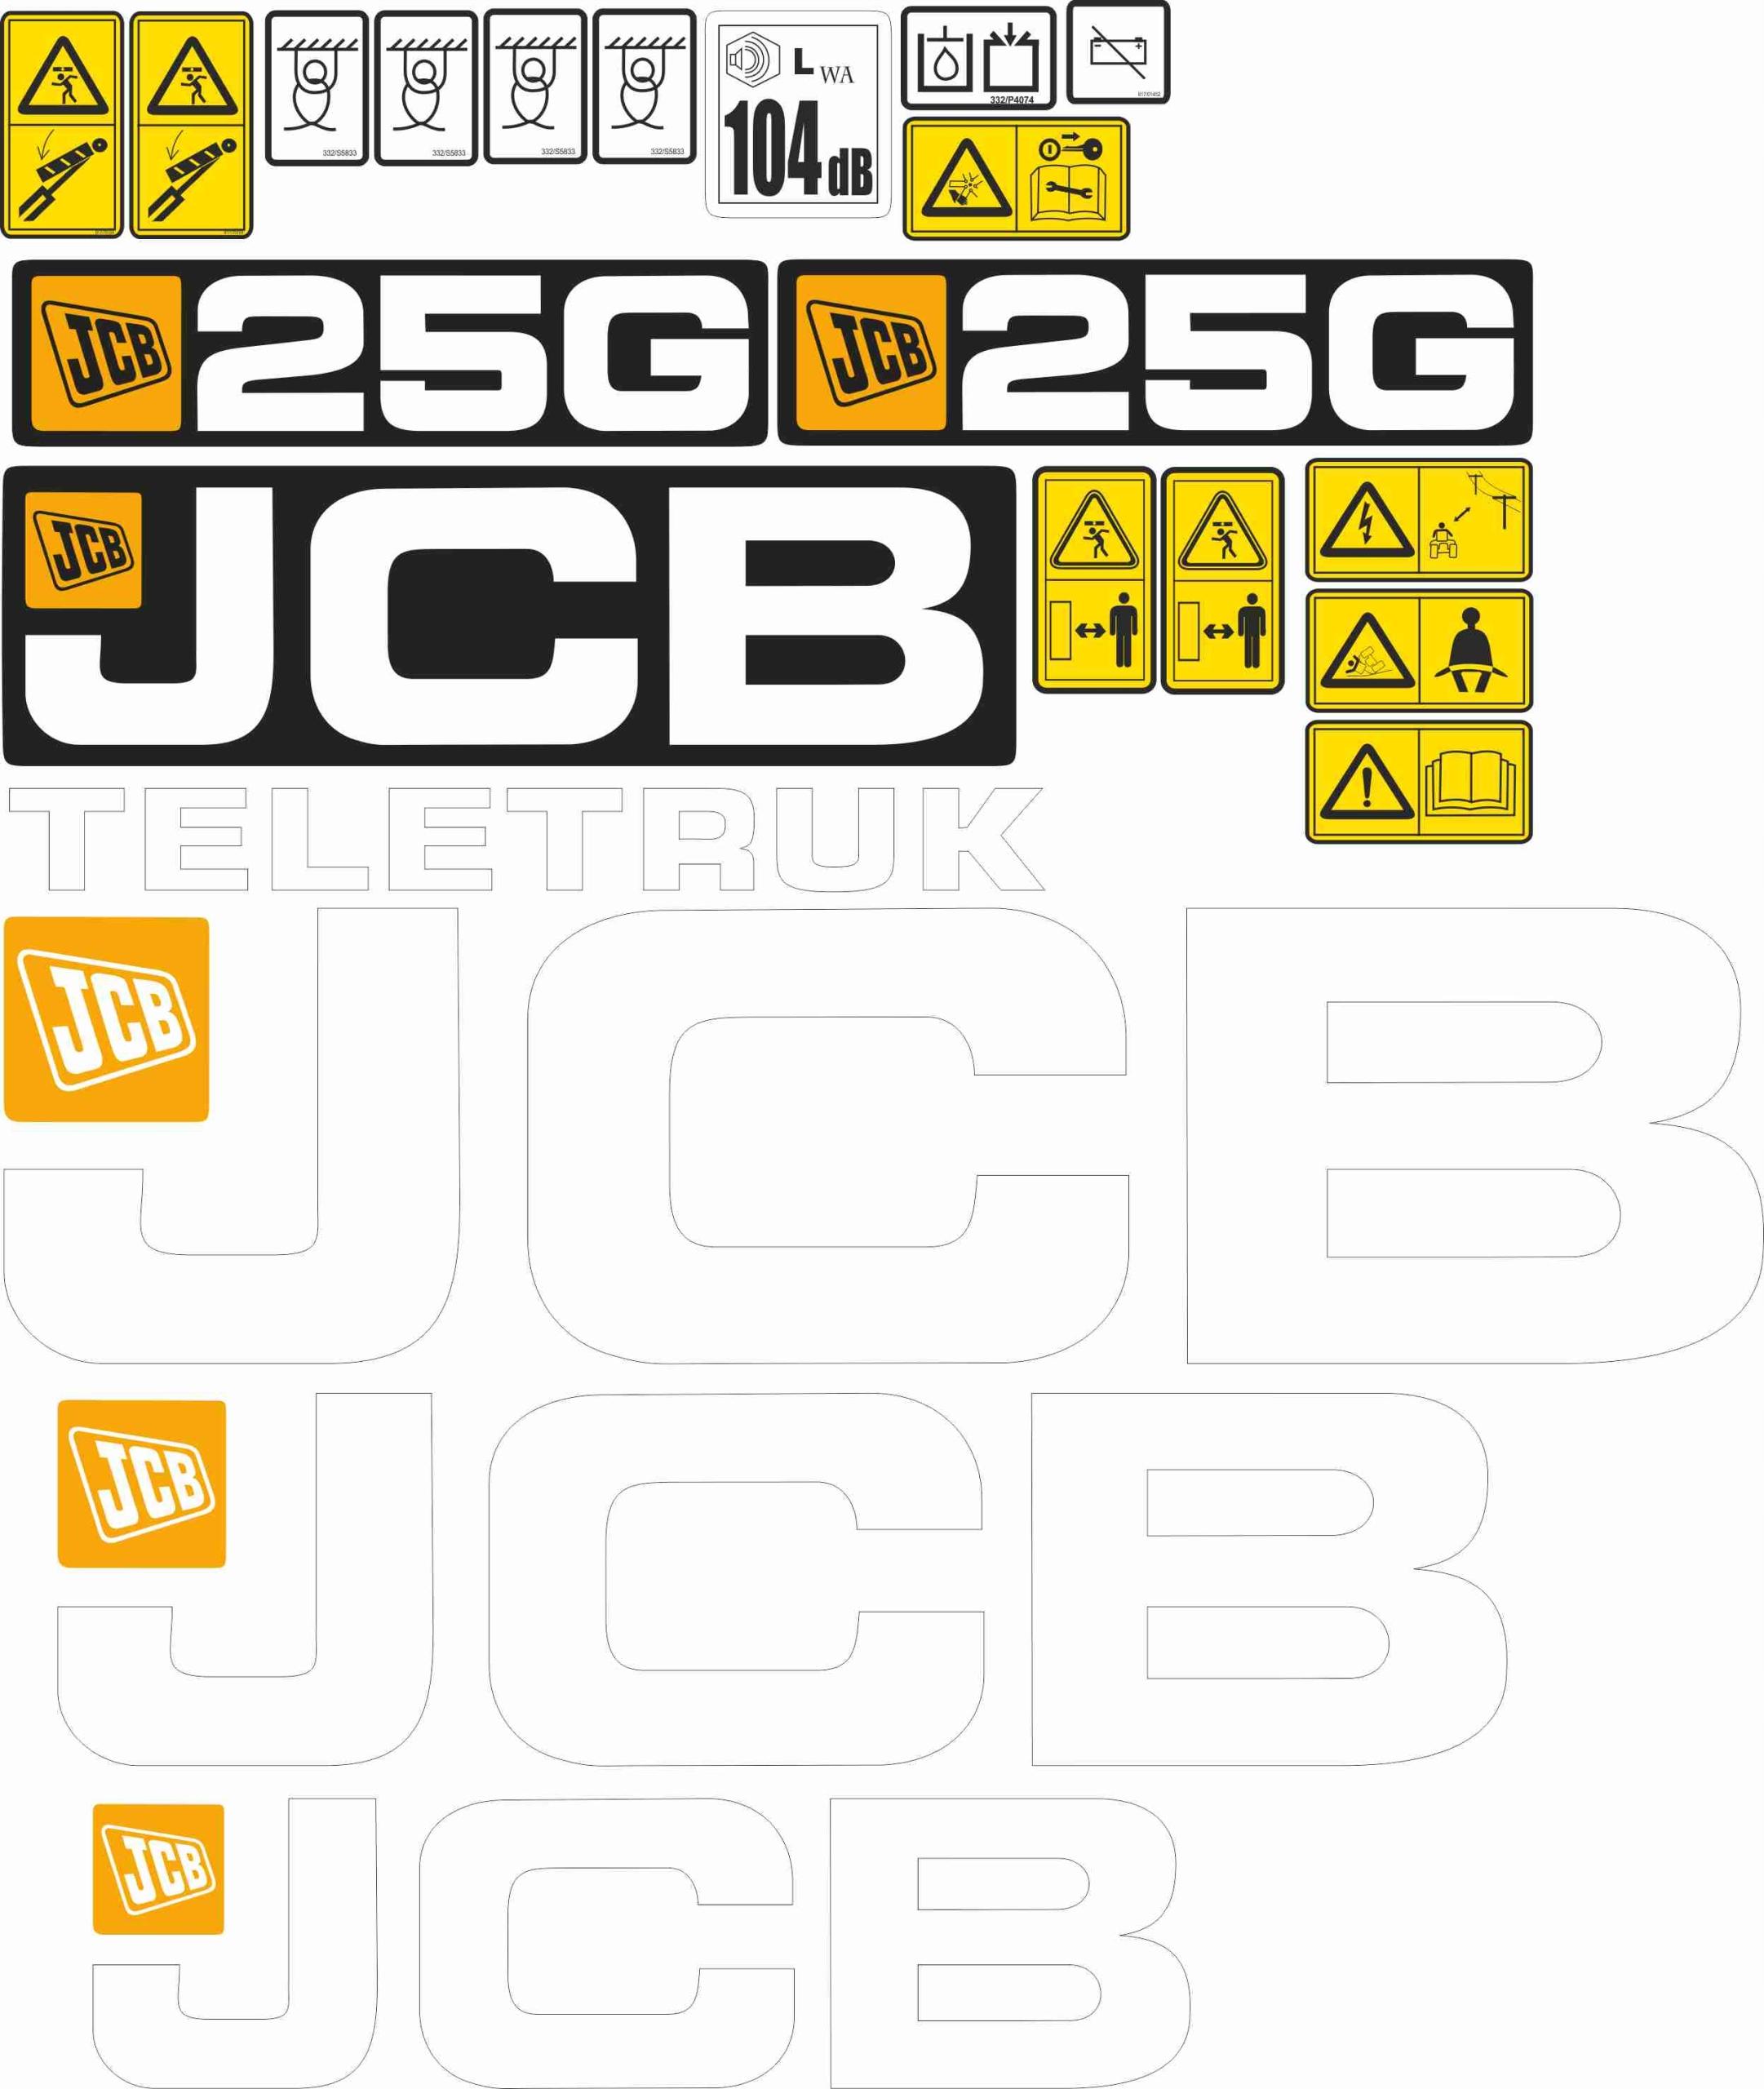 НАКЛЕЙКА СТИРАЛЬНАЯ JCB 20G; 25G; 30G; Тележка 35G